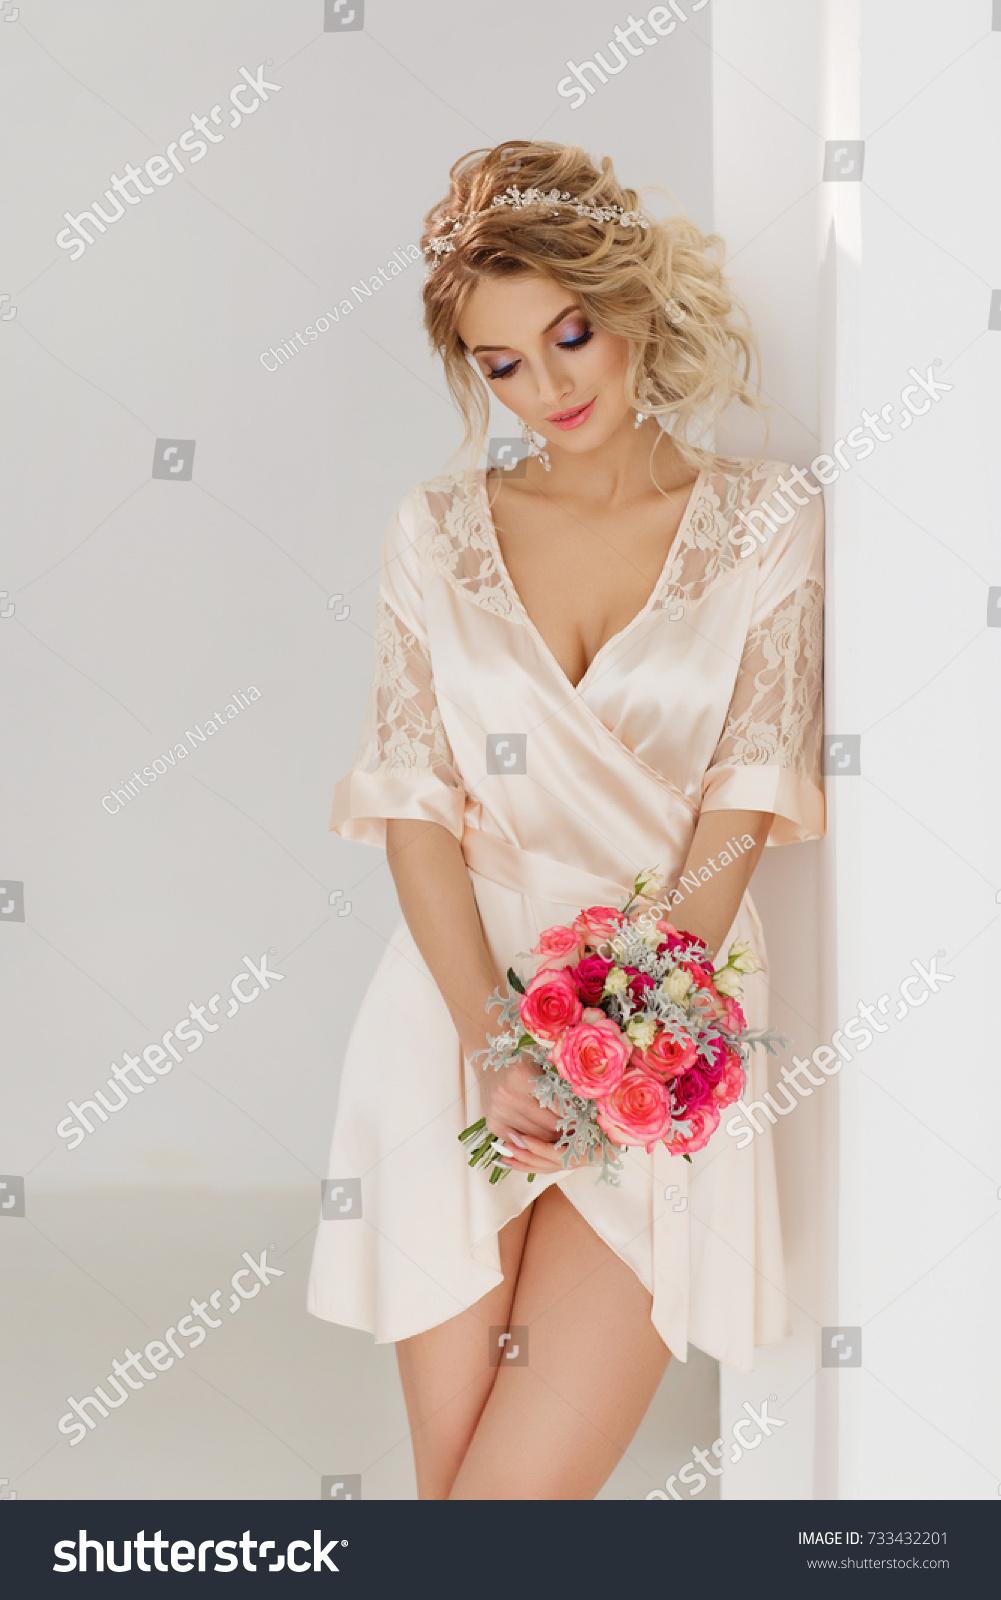 Portrait Beautiful Bride Wedding Bouquet Blonde Stock Photo (Royalty ...